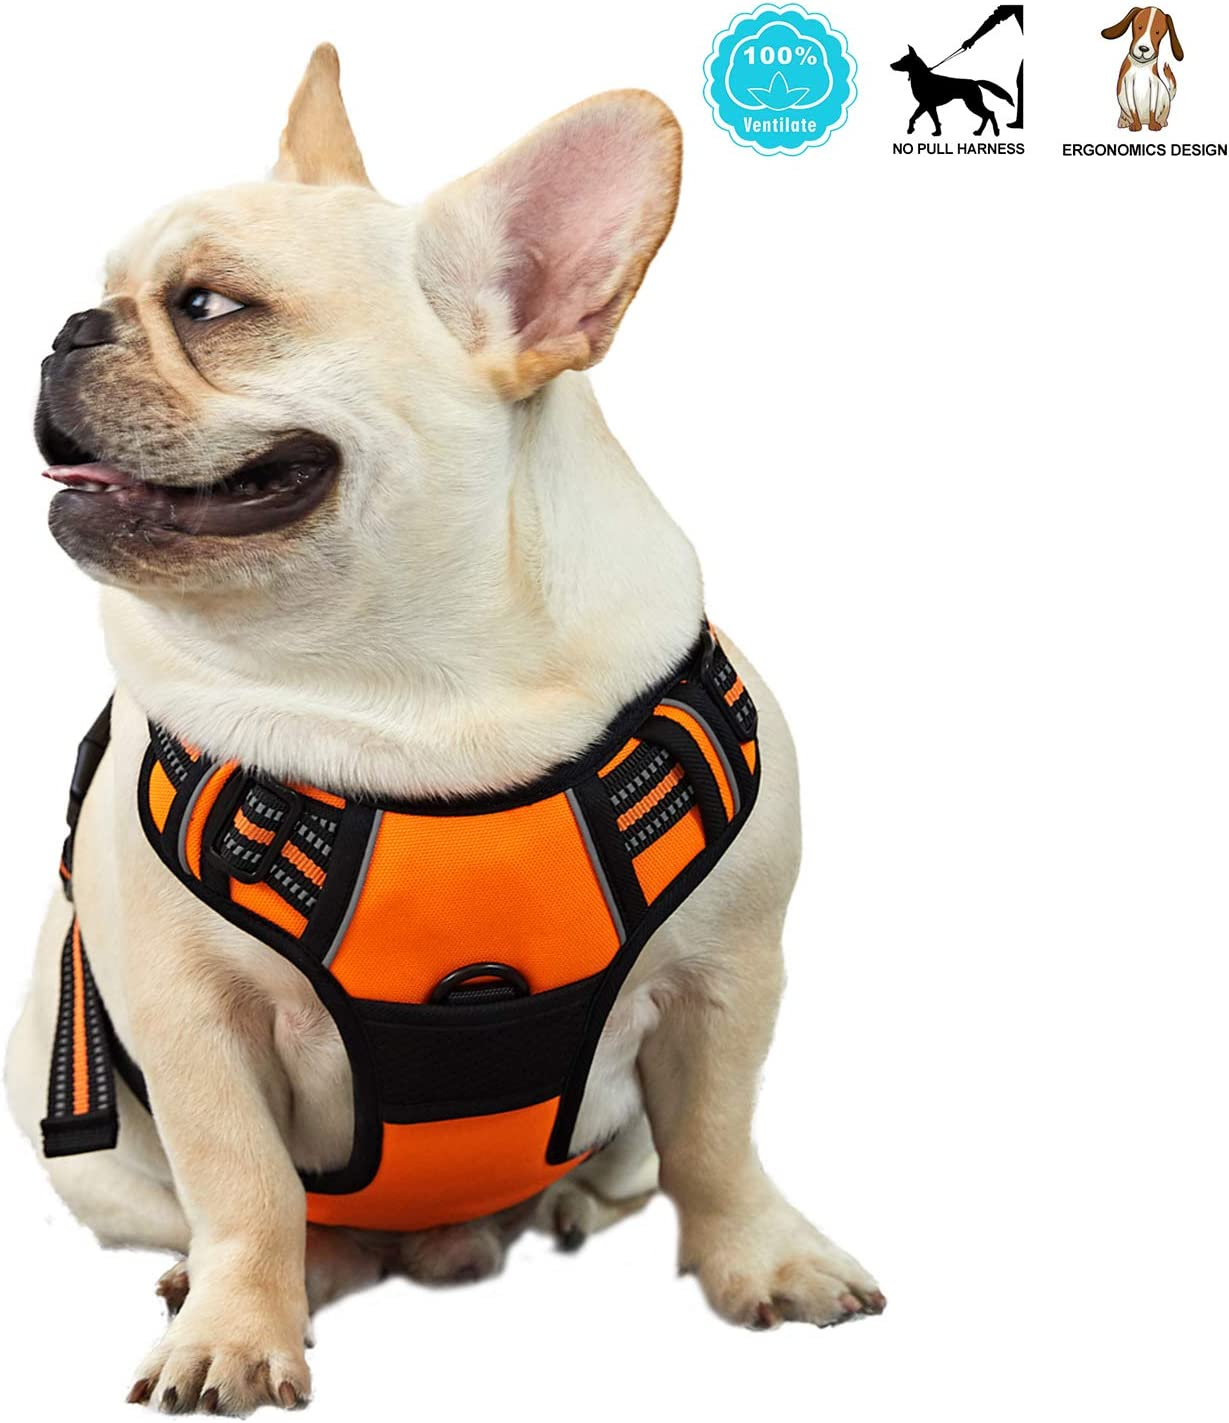 ANWA Dog Walking Harness No Pull, Adjustable Pet Reflective Soft Vest, Durable Dog Harness Control Handle Medium Orange